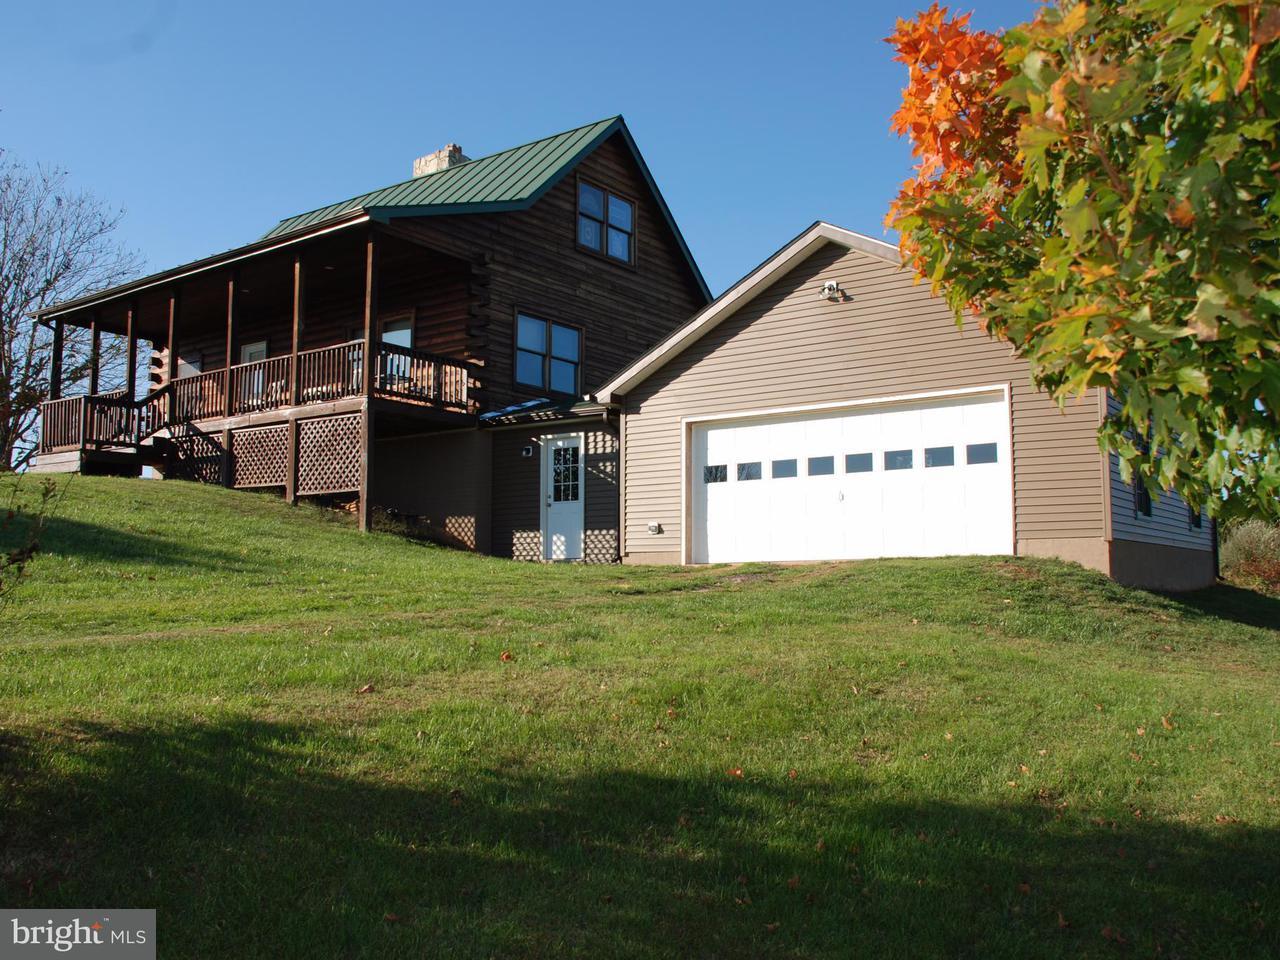 Single Family Home for Sale at 14311 EGGBORNSVILLE Road 14311 EGGBORNSVILLE Road Culpeper, Virginia 22701 United States